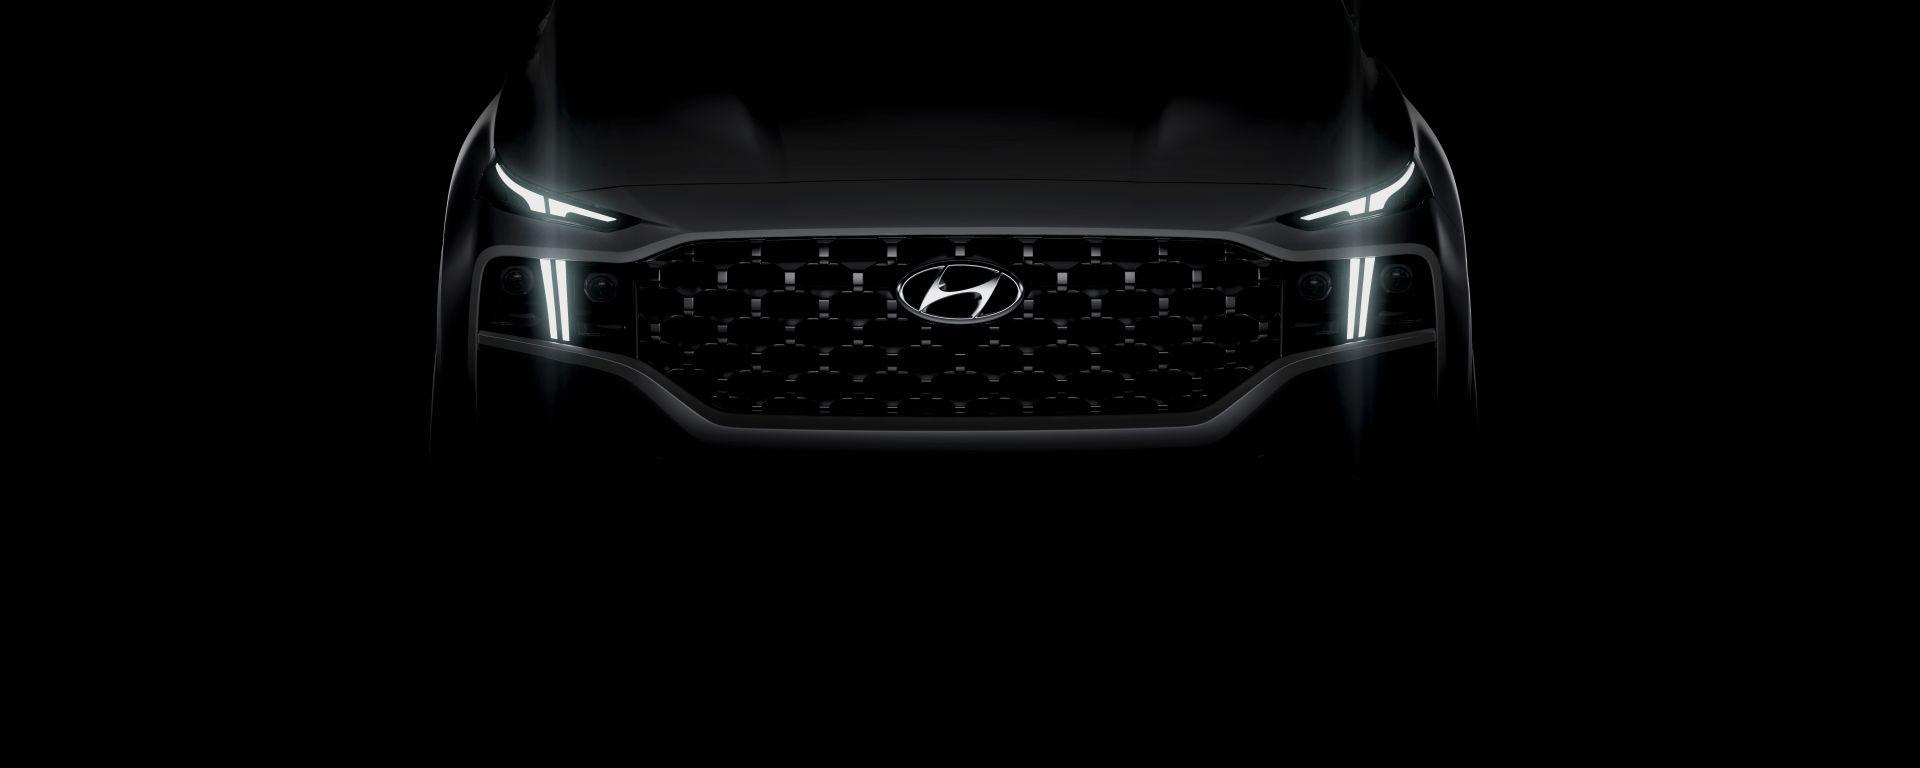 Nuova Hyundai Santa Fe 2020: primo teaser